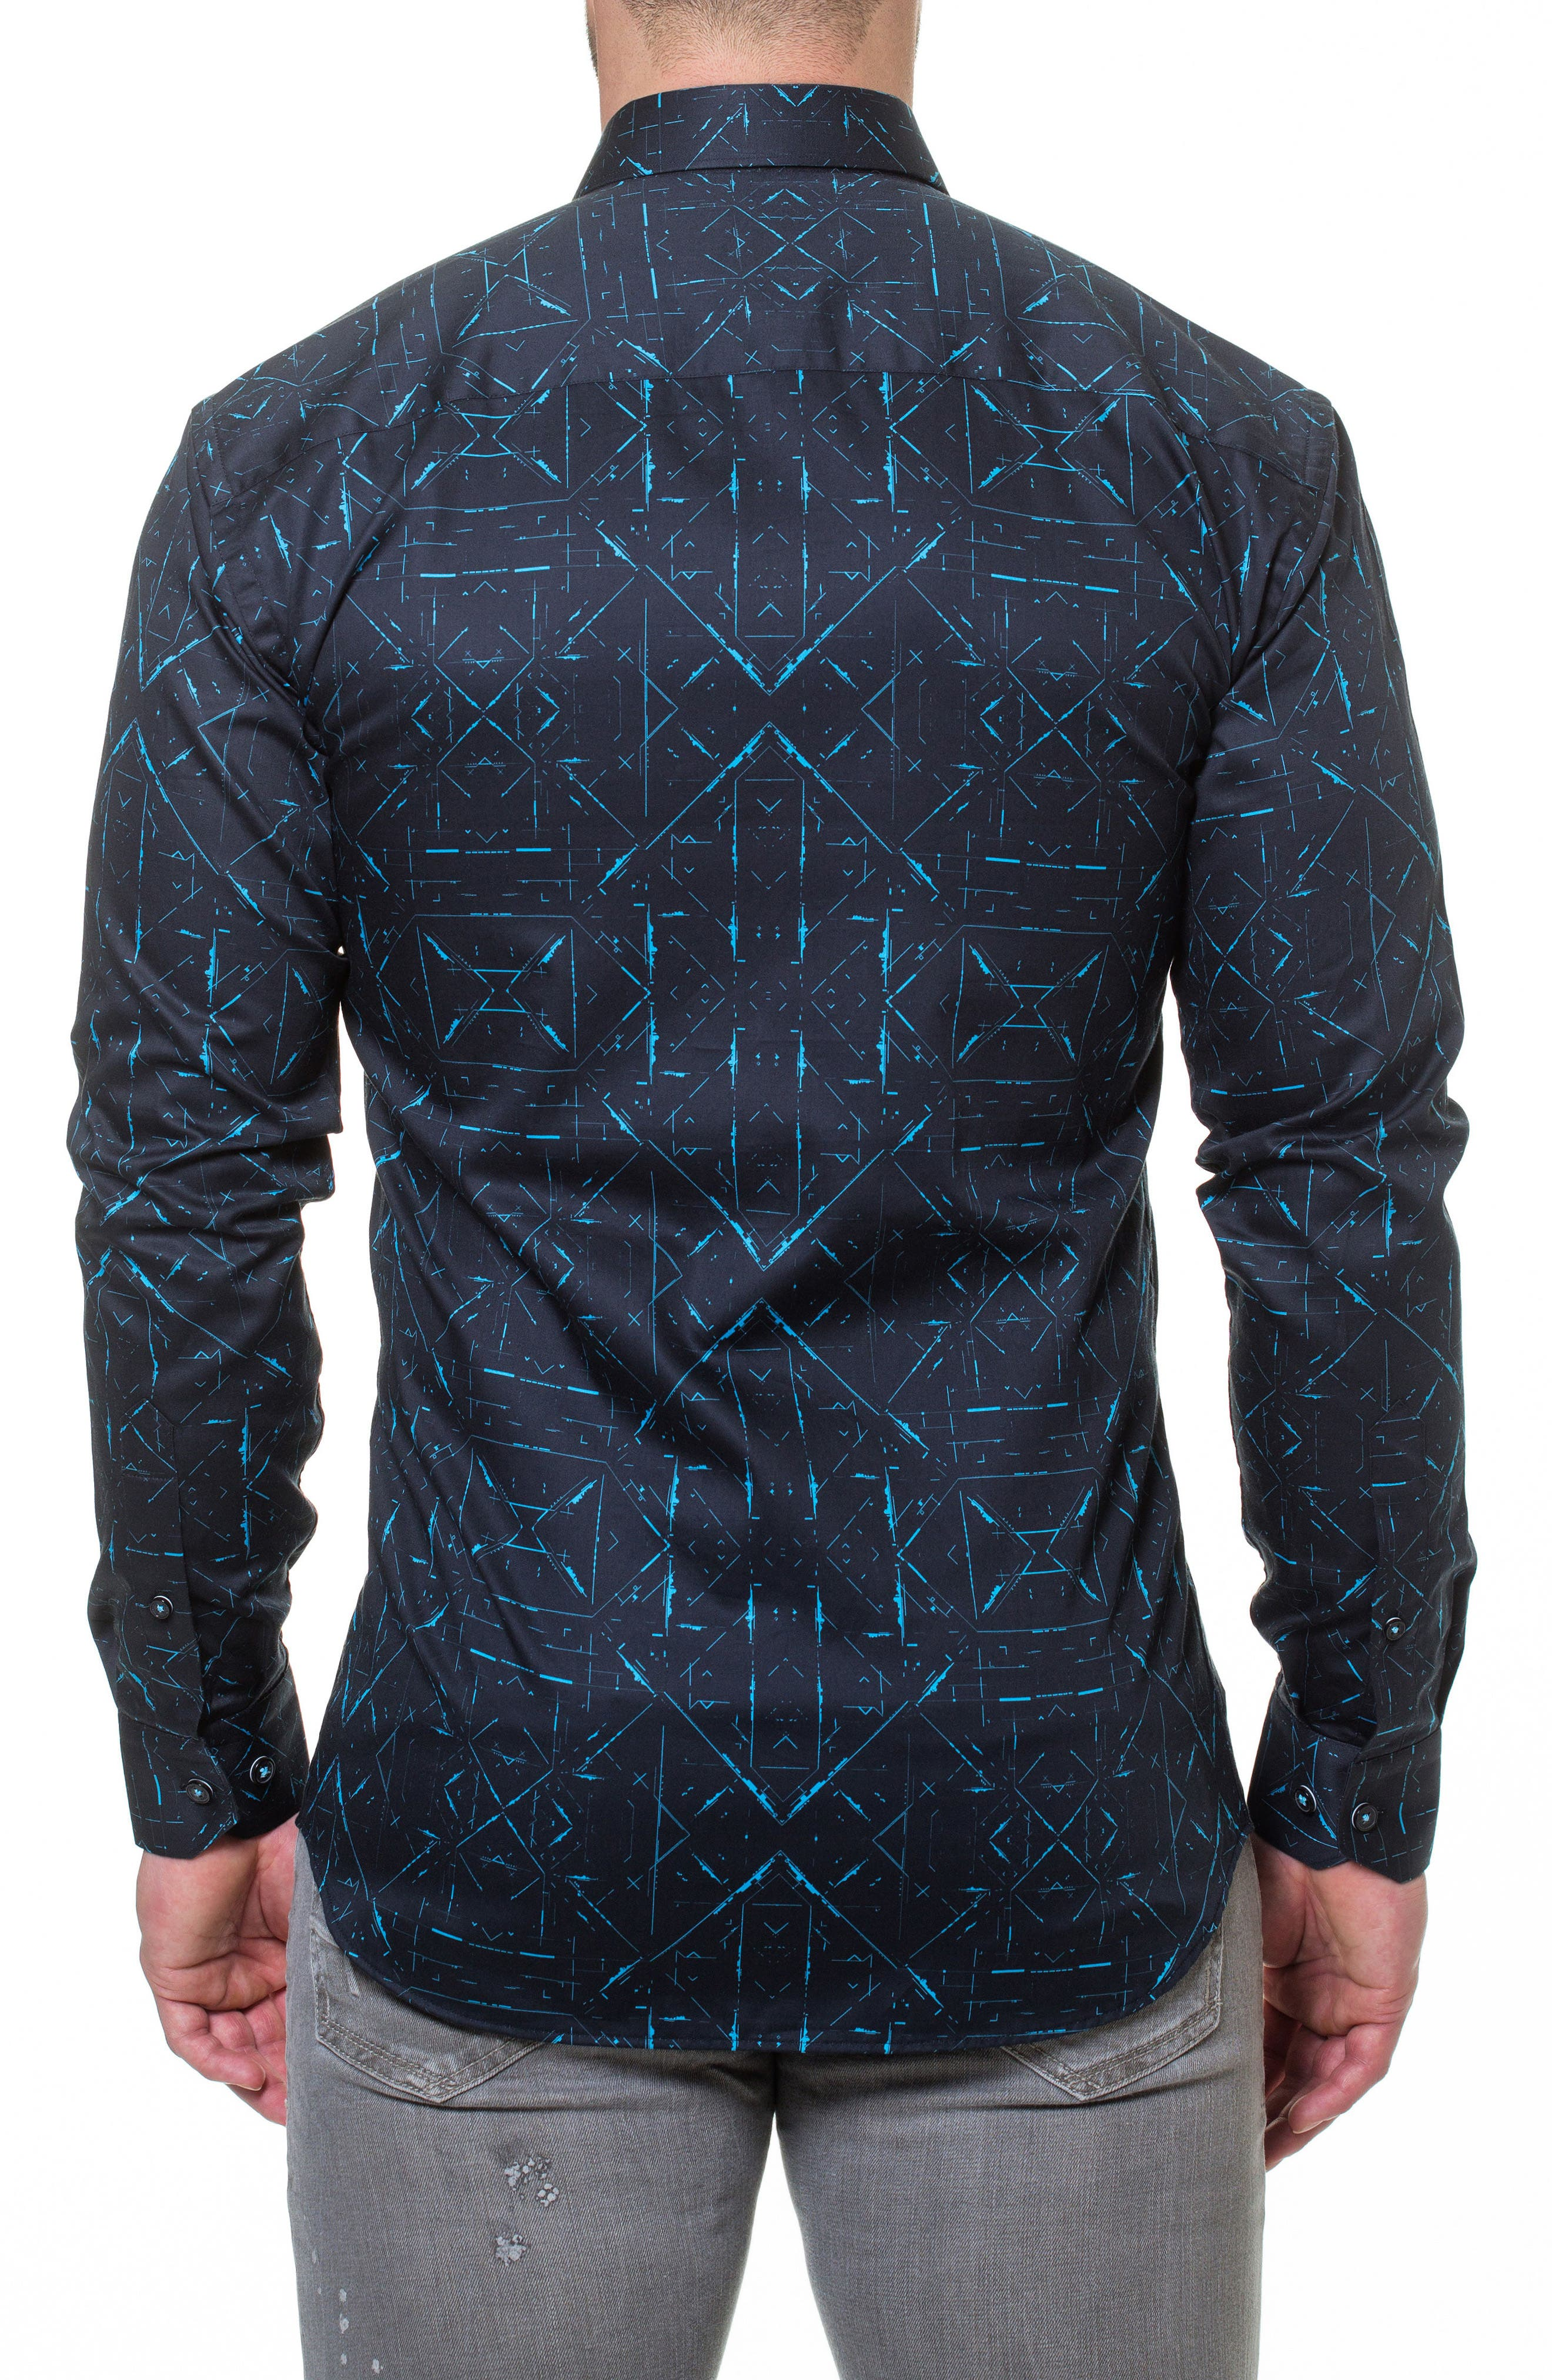 Luxor Sketch Black Slim Fit Sport Shirt,                             Alternate thumbnail 2, color,                             007